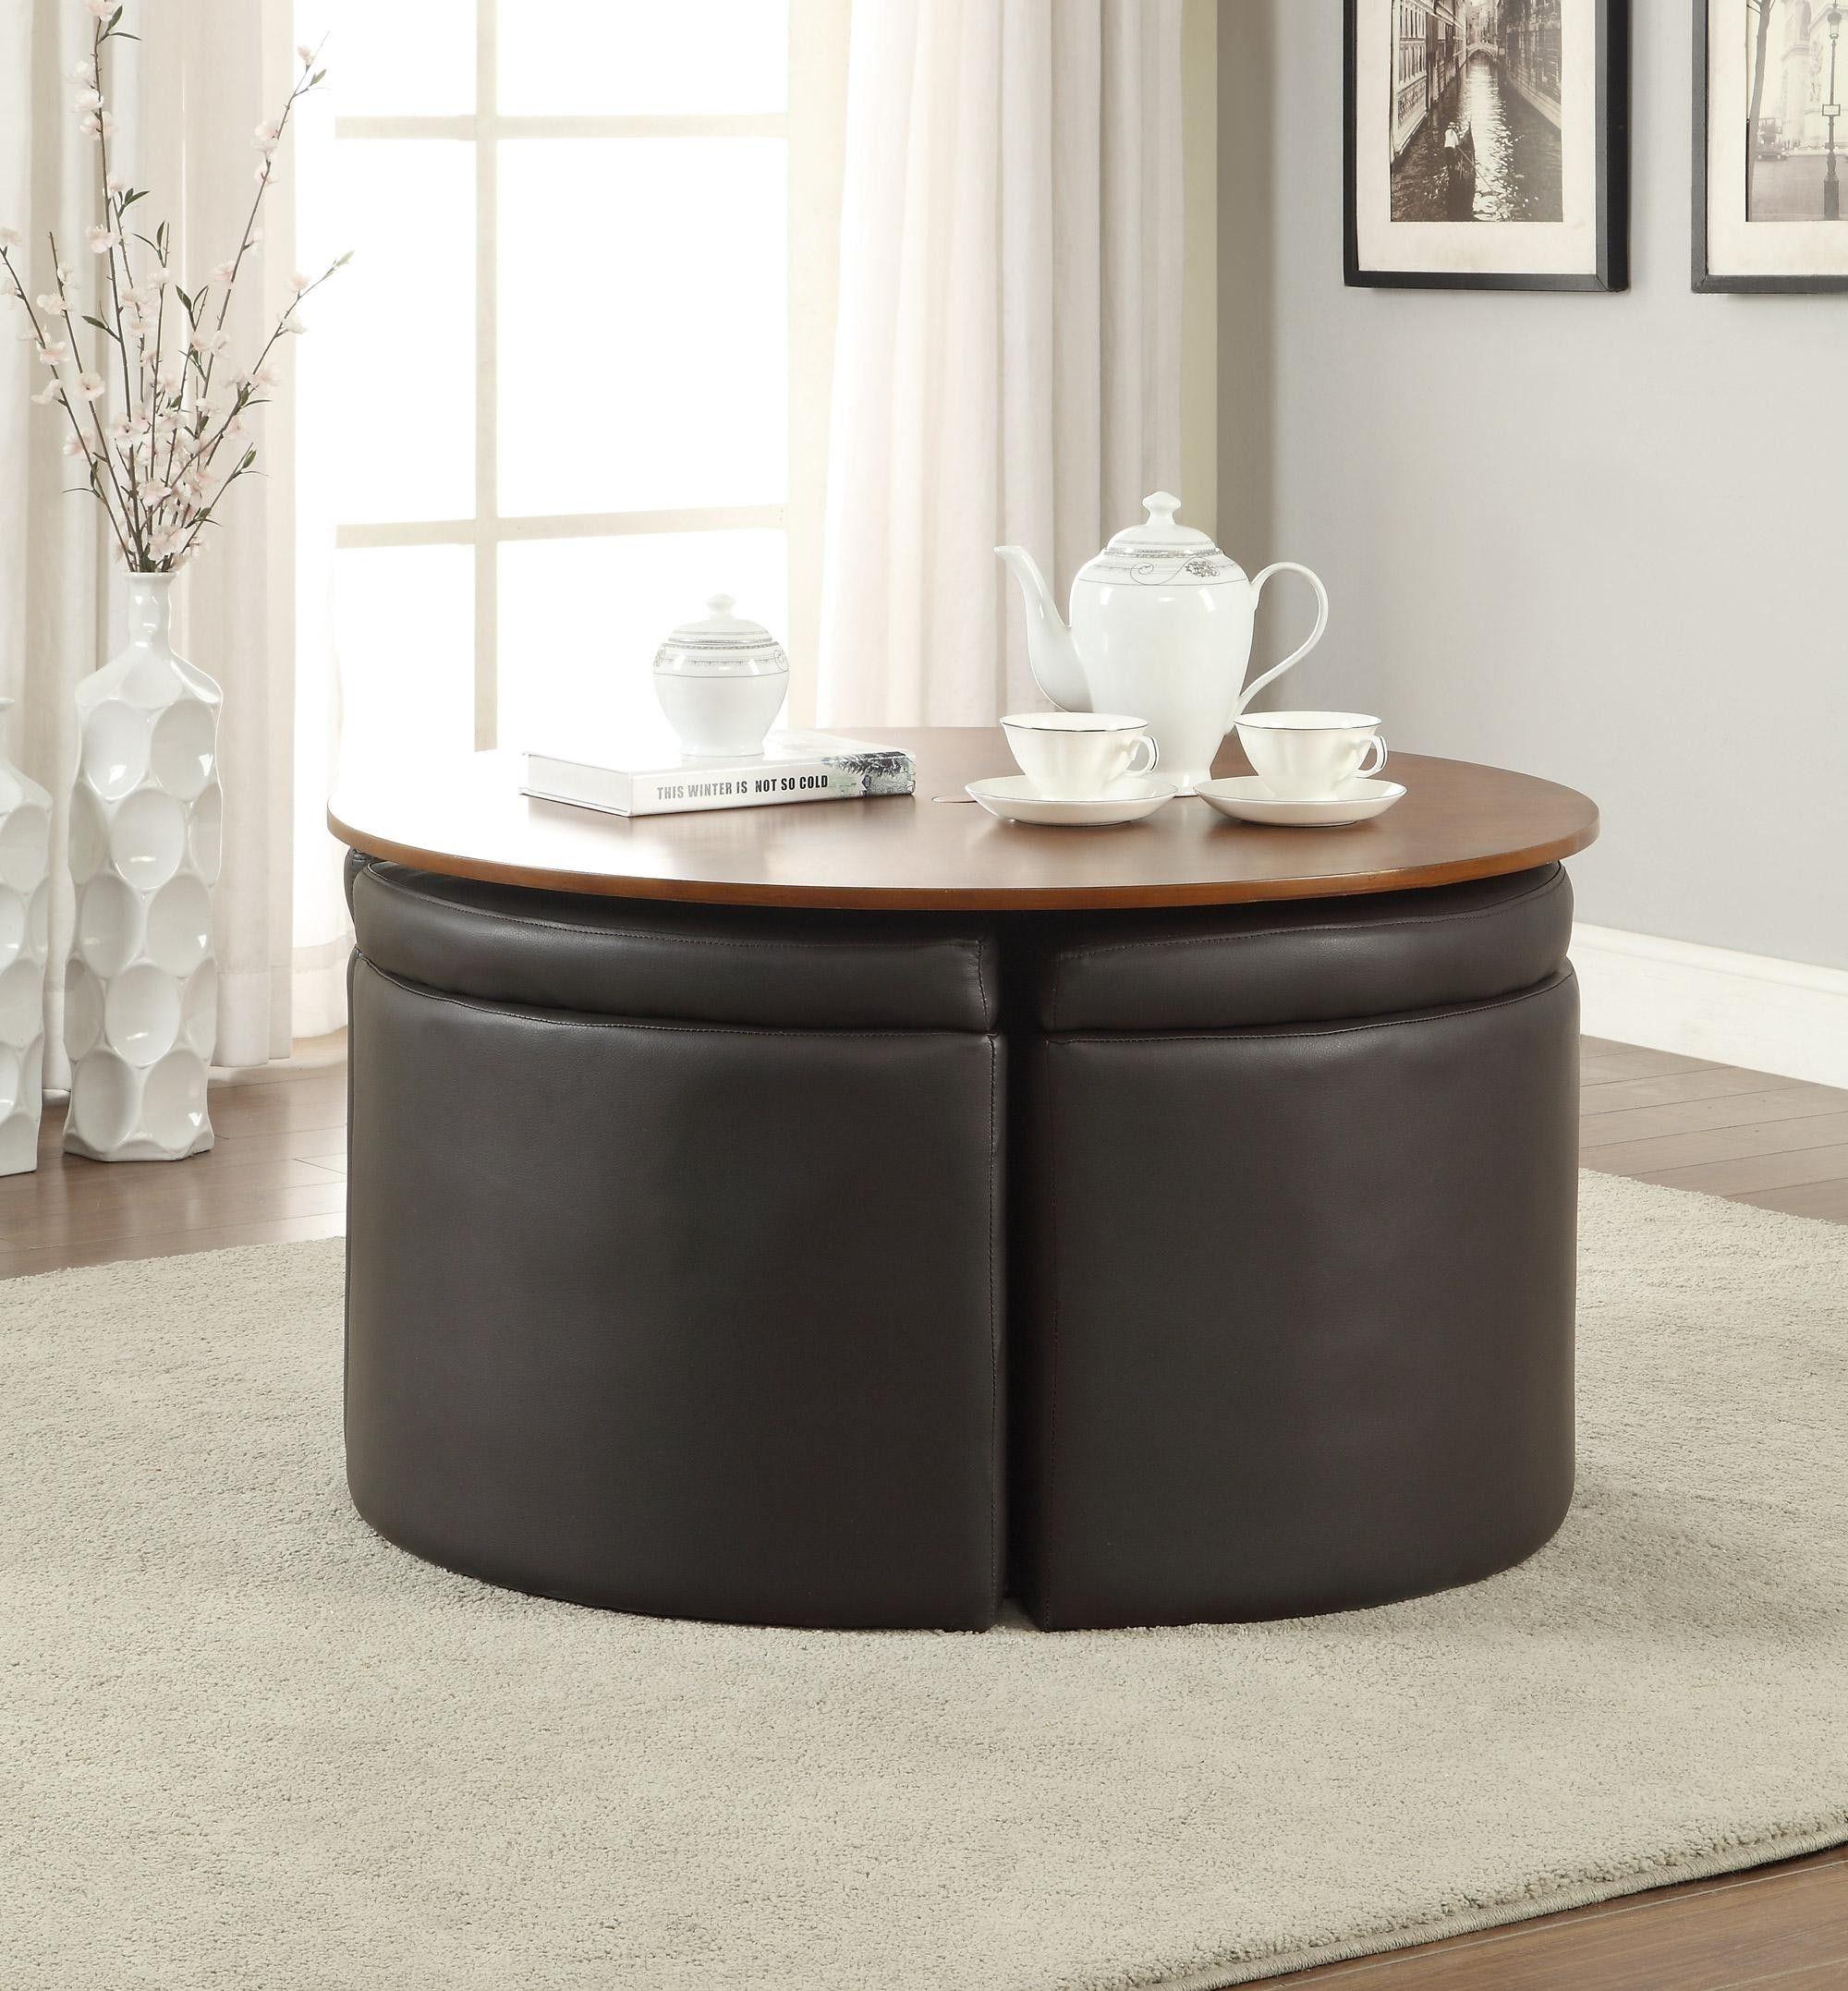 5 pc coffee table set 703240 coaster furniture pinterest 5 pc coffee table set 703240 coaster geotapseo Image collections